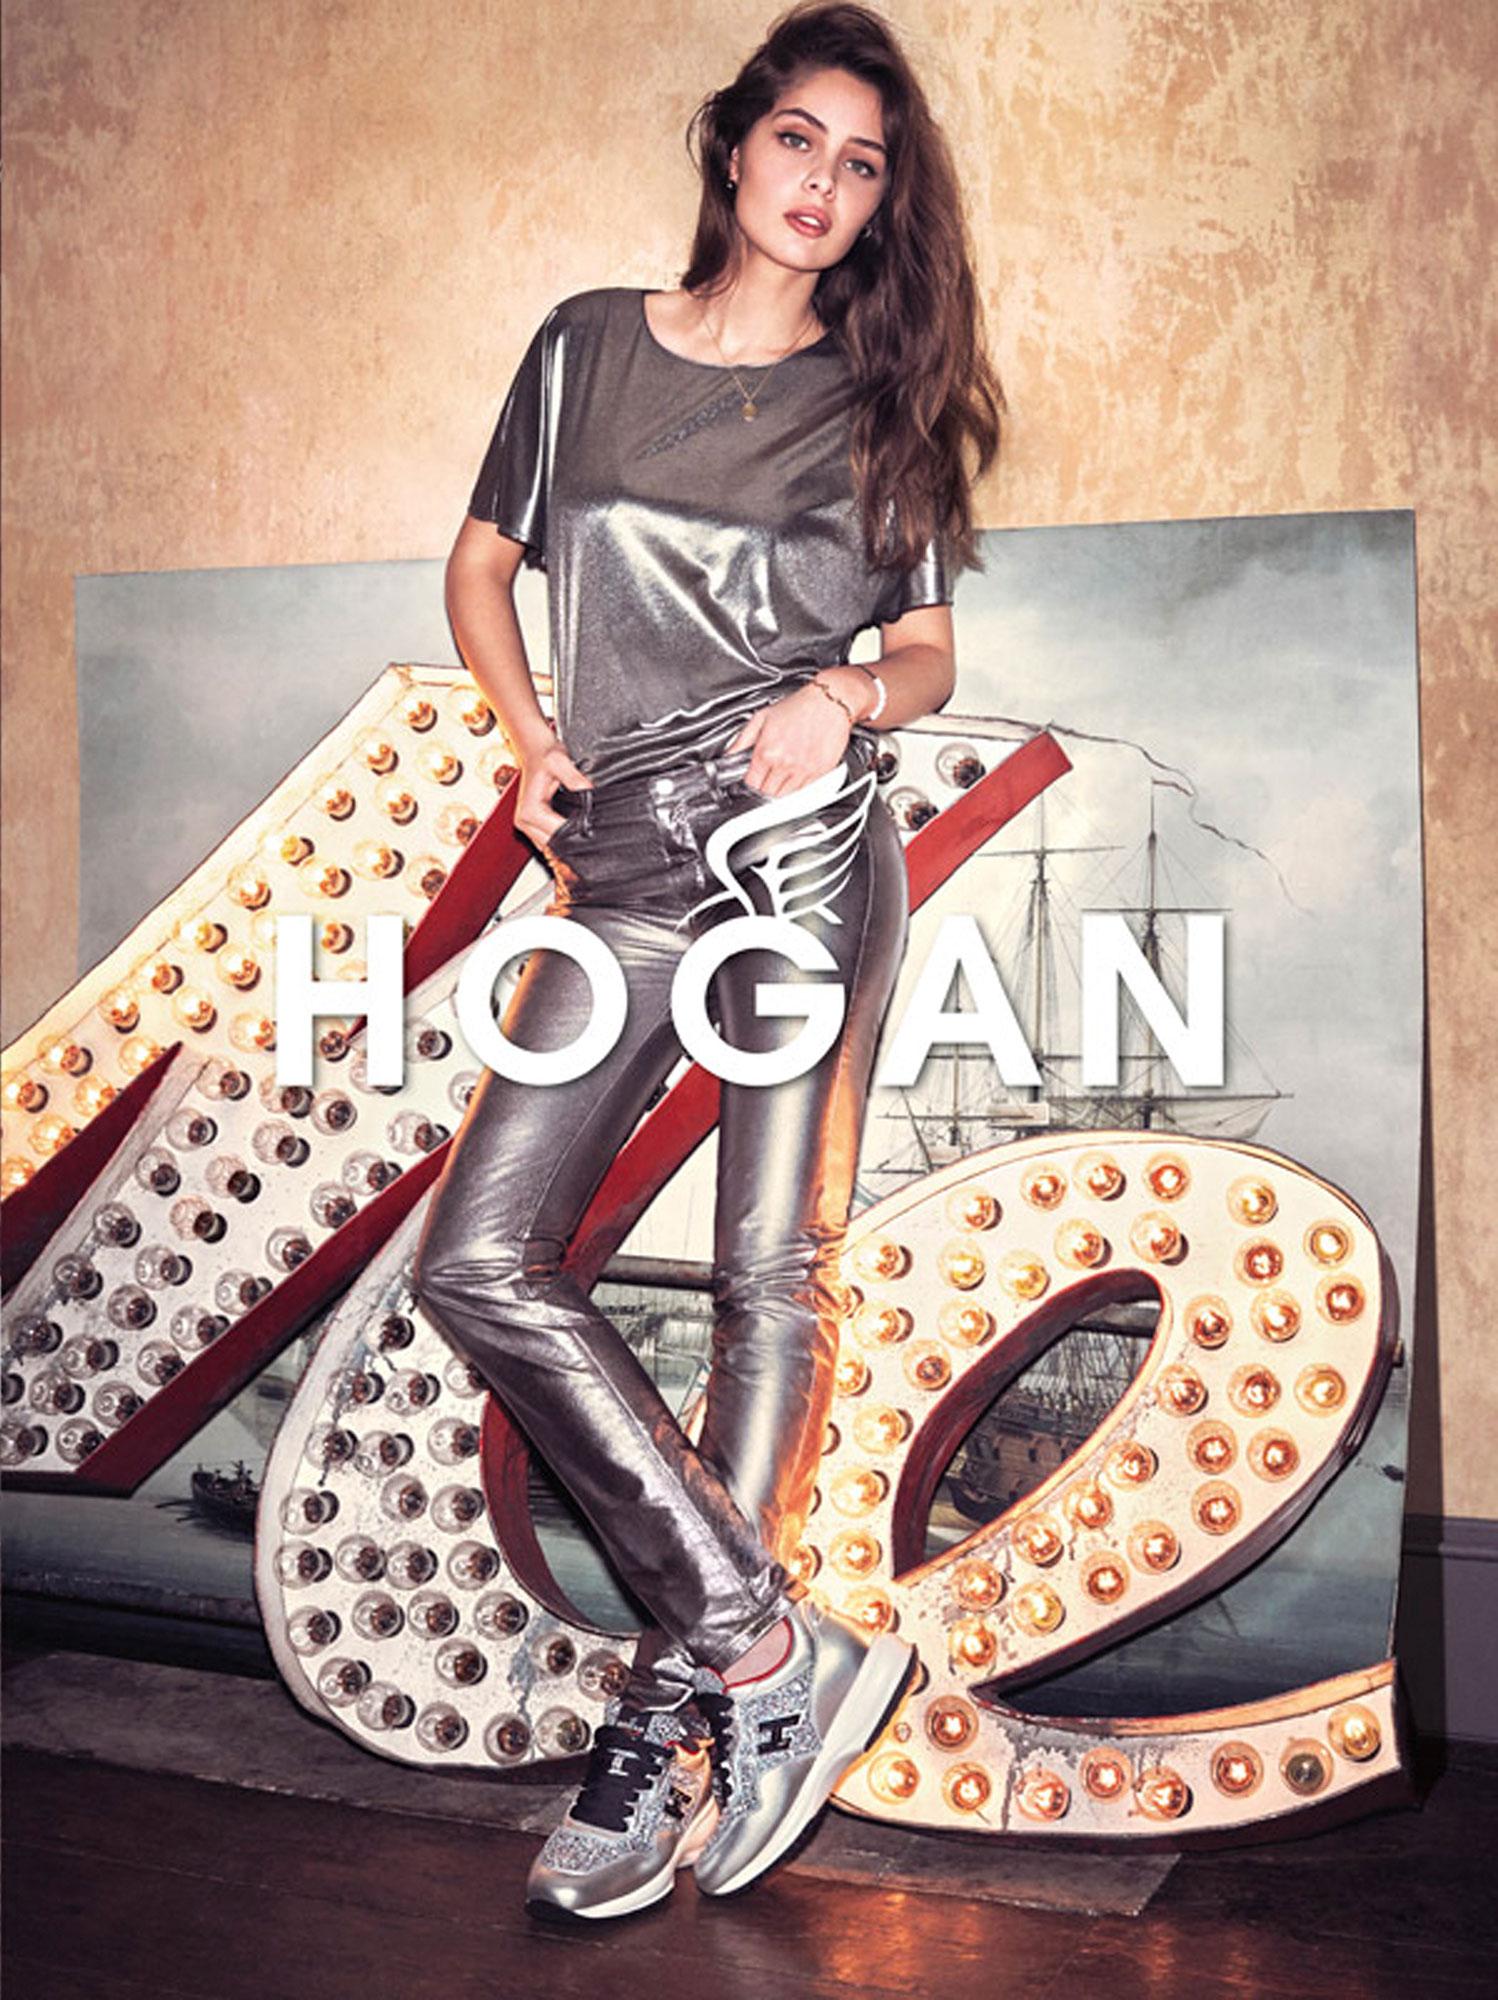 Hogan Campaign SS 2016 | Michelangelo di Battista | Hogan | Numerique Retouch Photo Retouching Studio